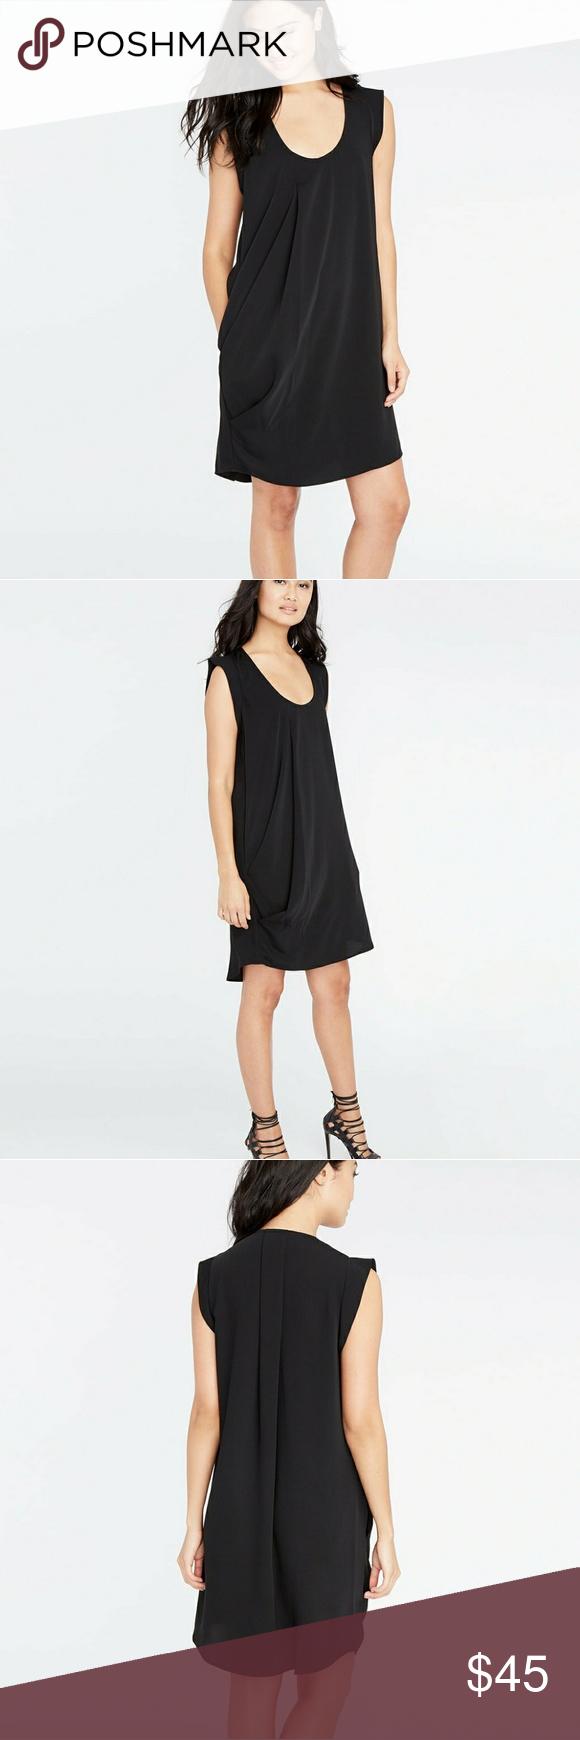 c0ea6d8d266 Scoop Neck · Rachel Roy Swoop Pleat Dress In Black NWOT Size L Rachel Roy  Size Large Swoop Pleat